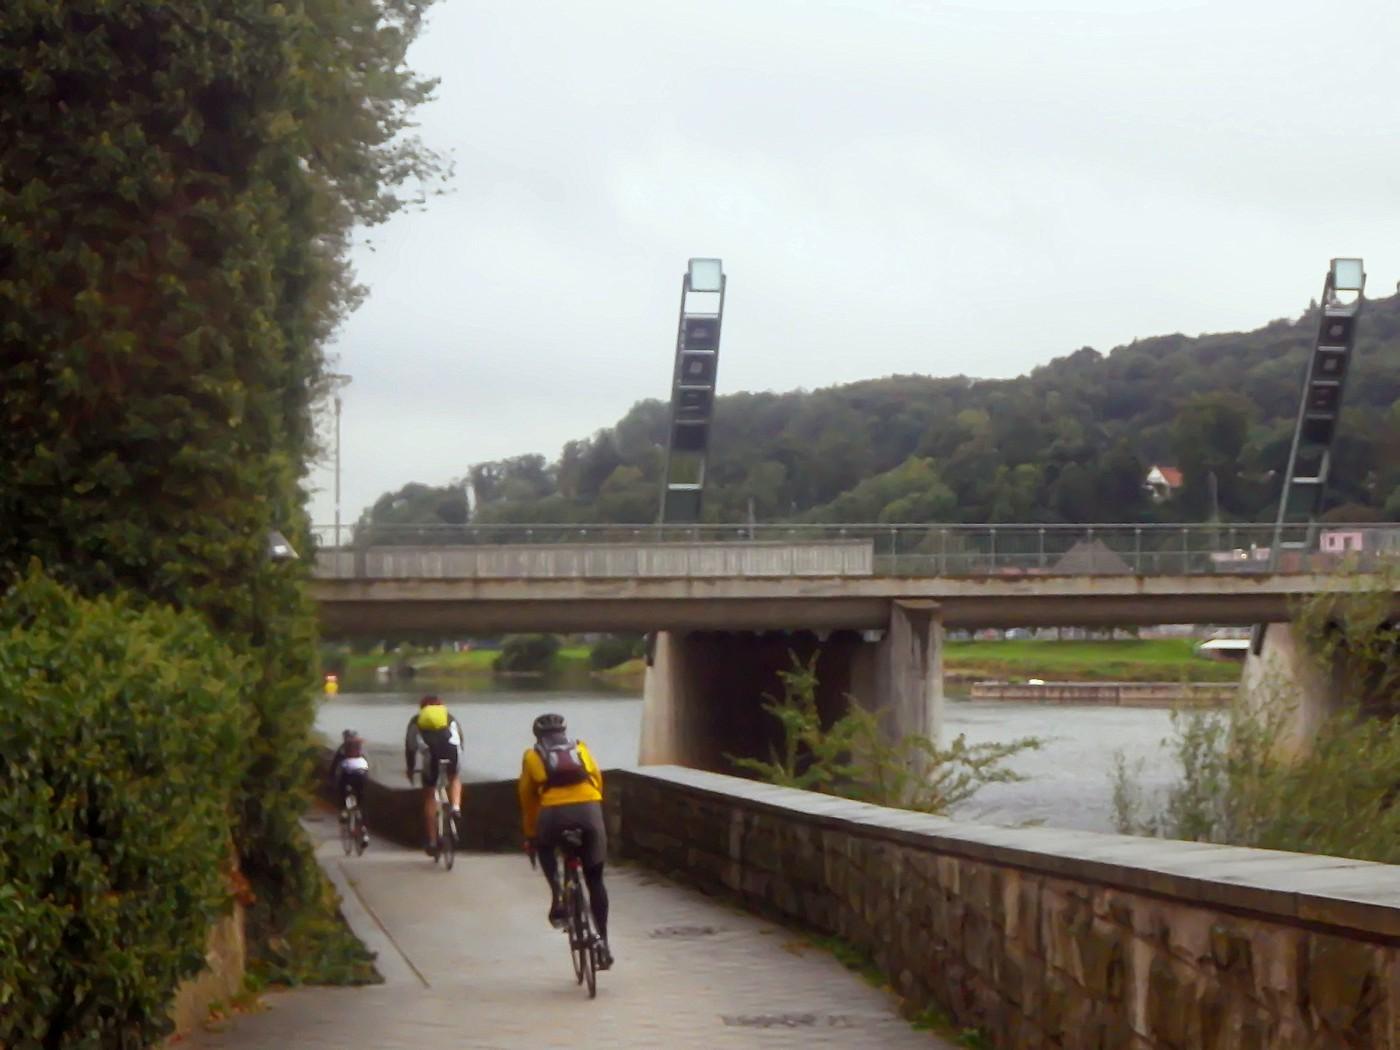 Hamelner Weserpromenade